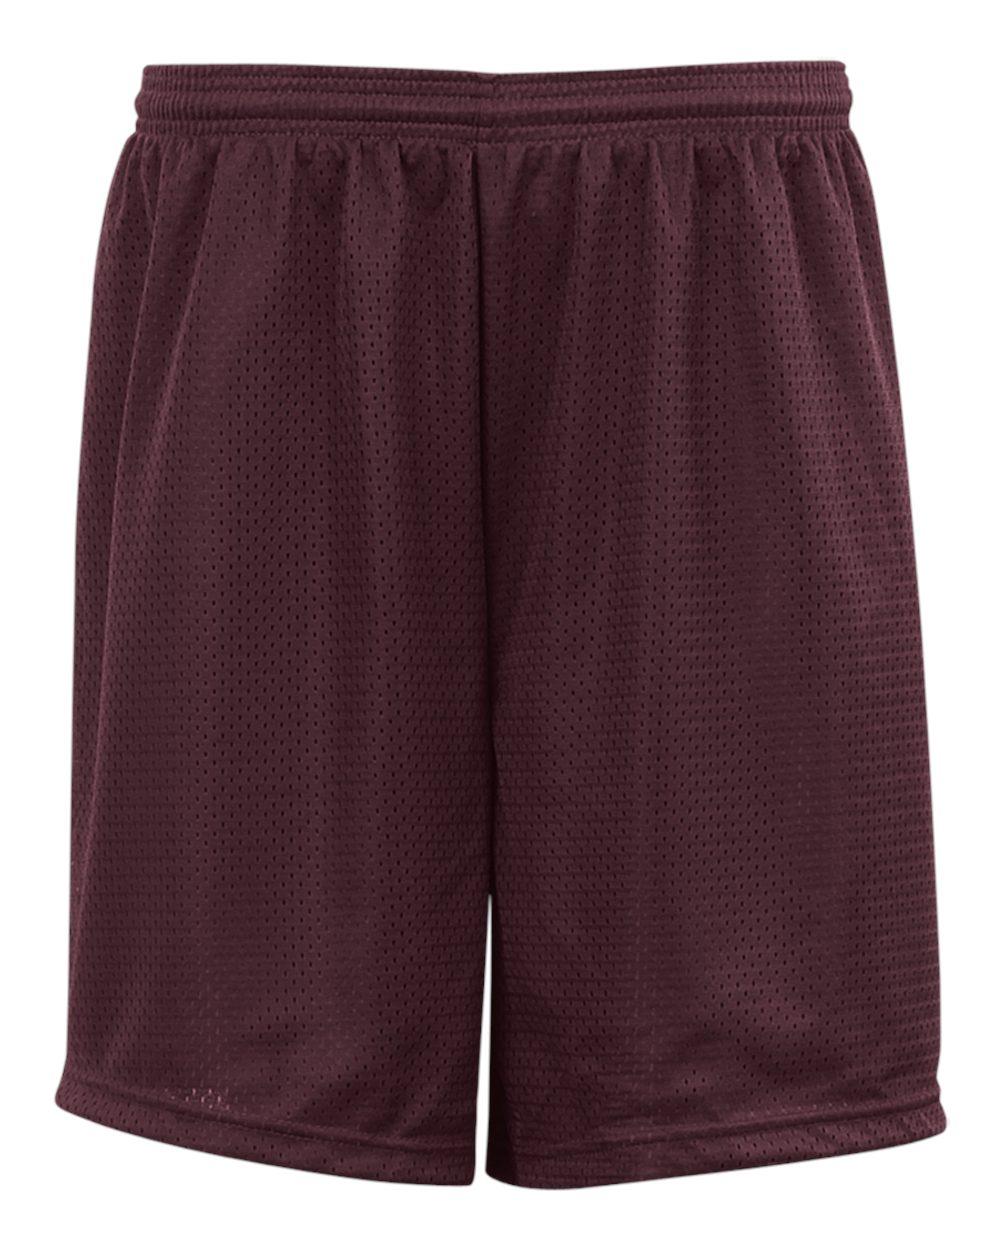 Mesh/Tricot 9 Inch Short - Maroon